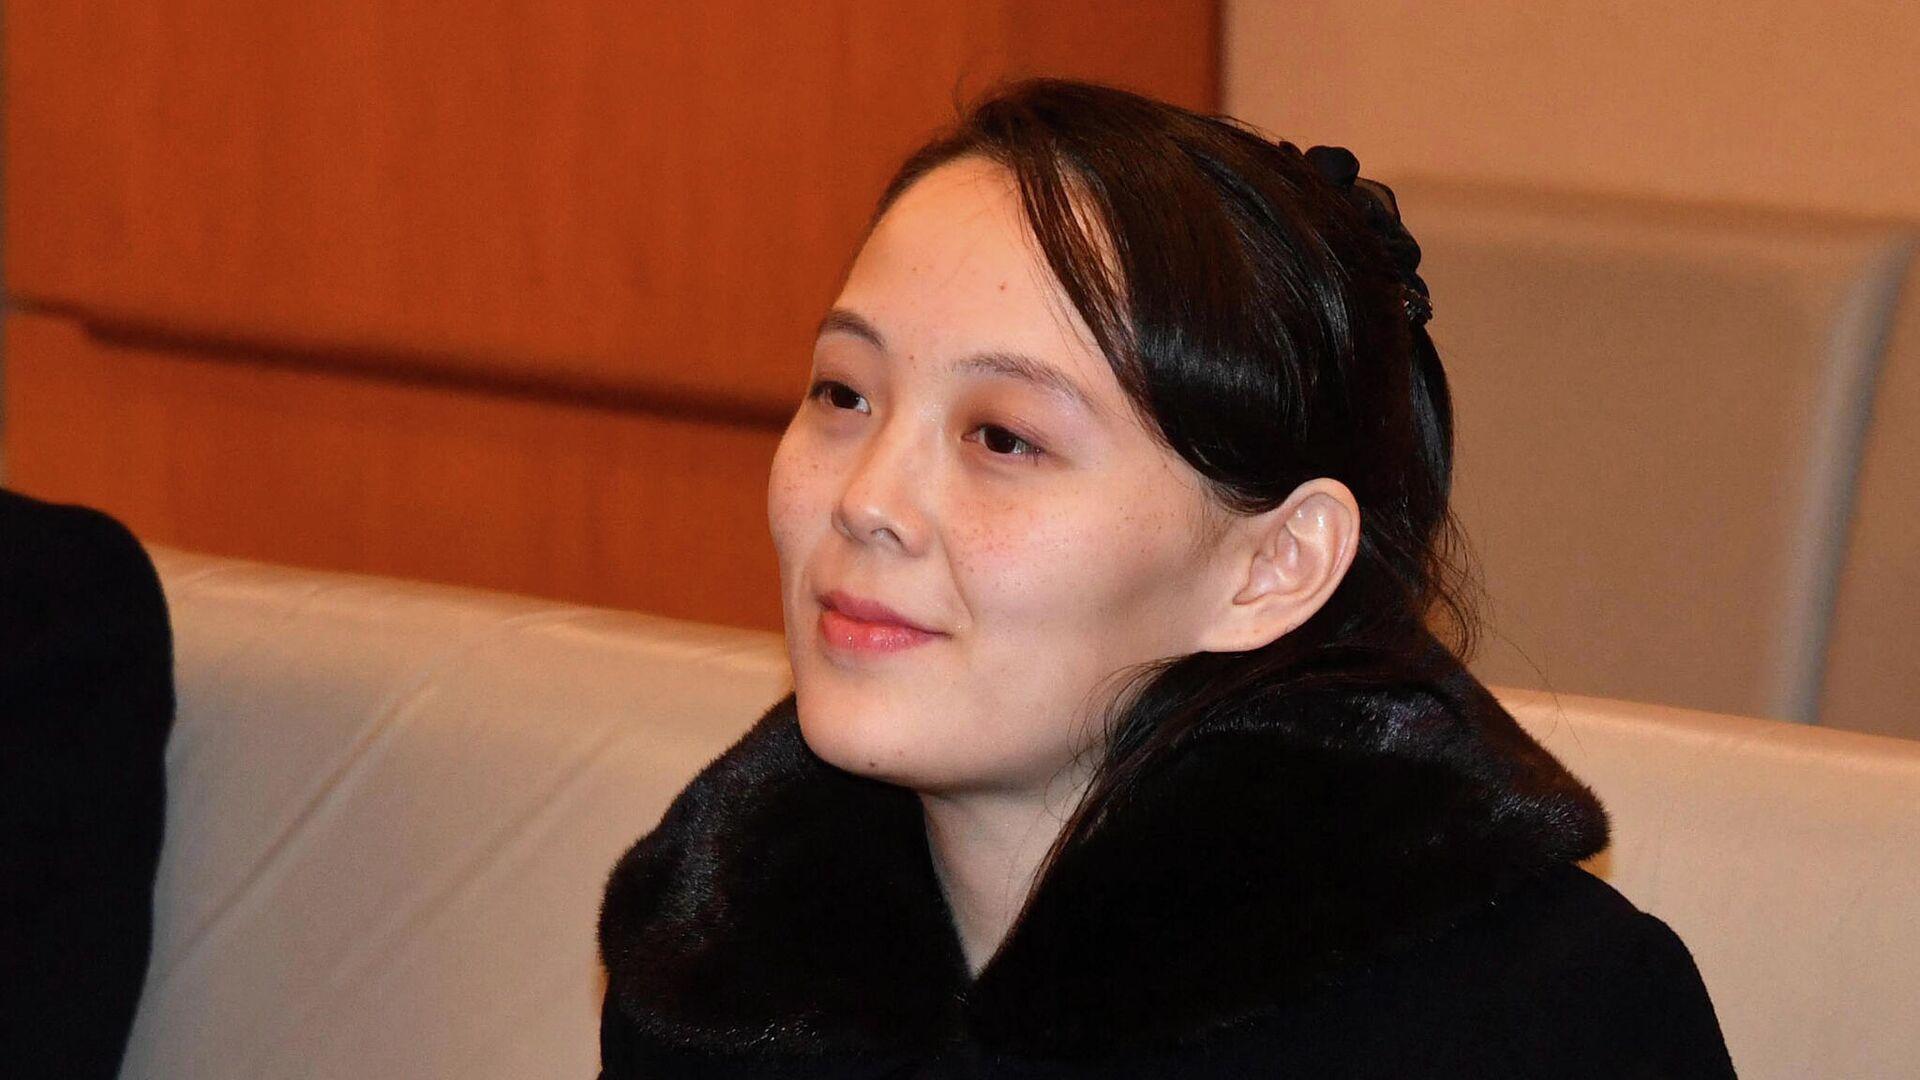 Kim Yo-jong, la hermana del líder norcoreano Kim Jong-un - Sputnik Mundo, 1920, 03.06.2021